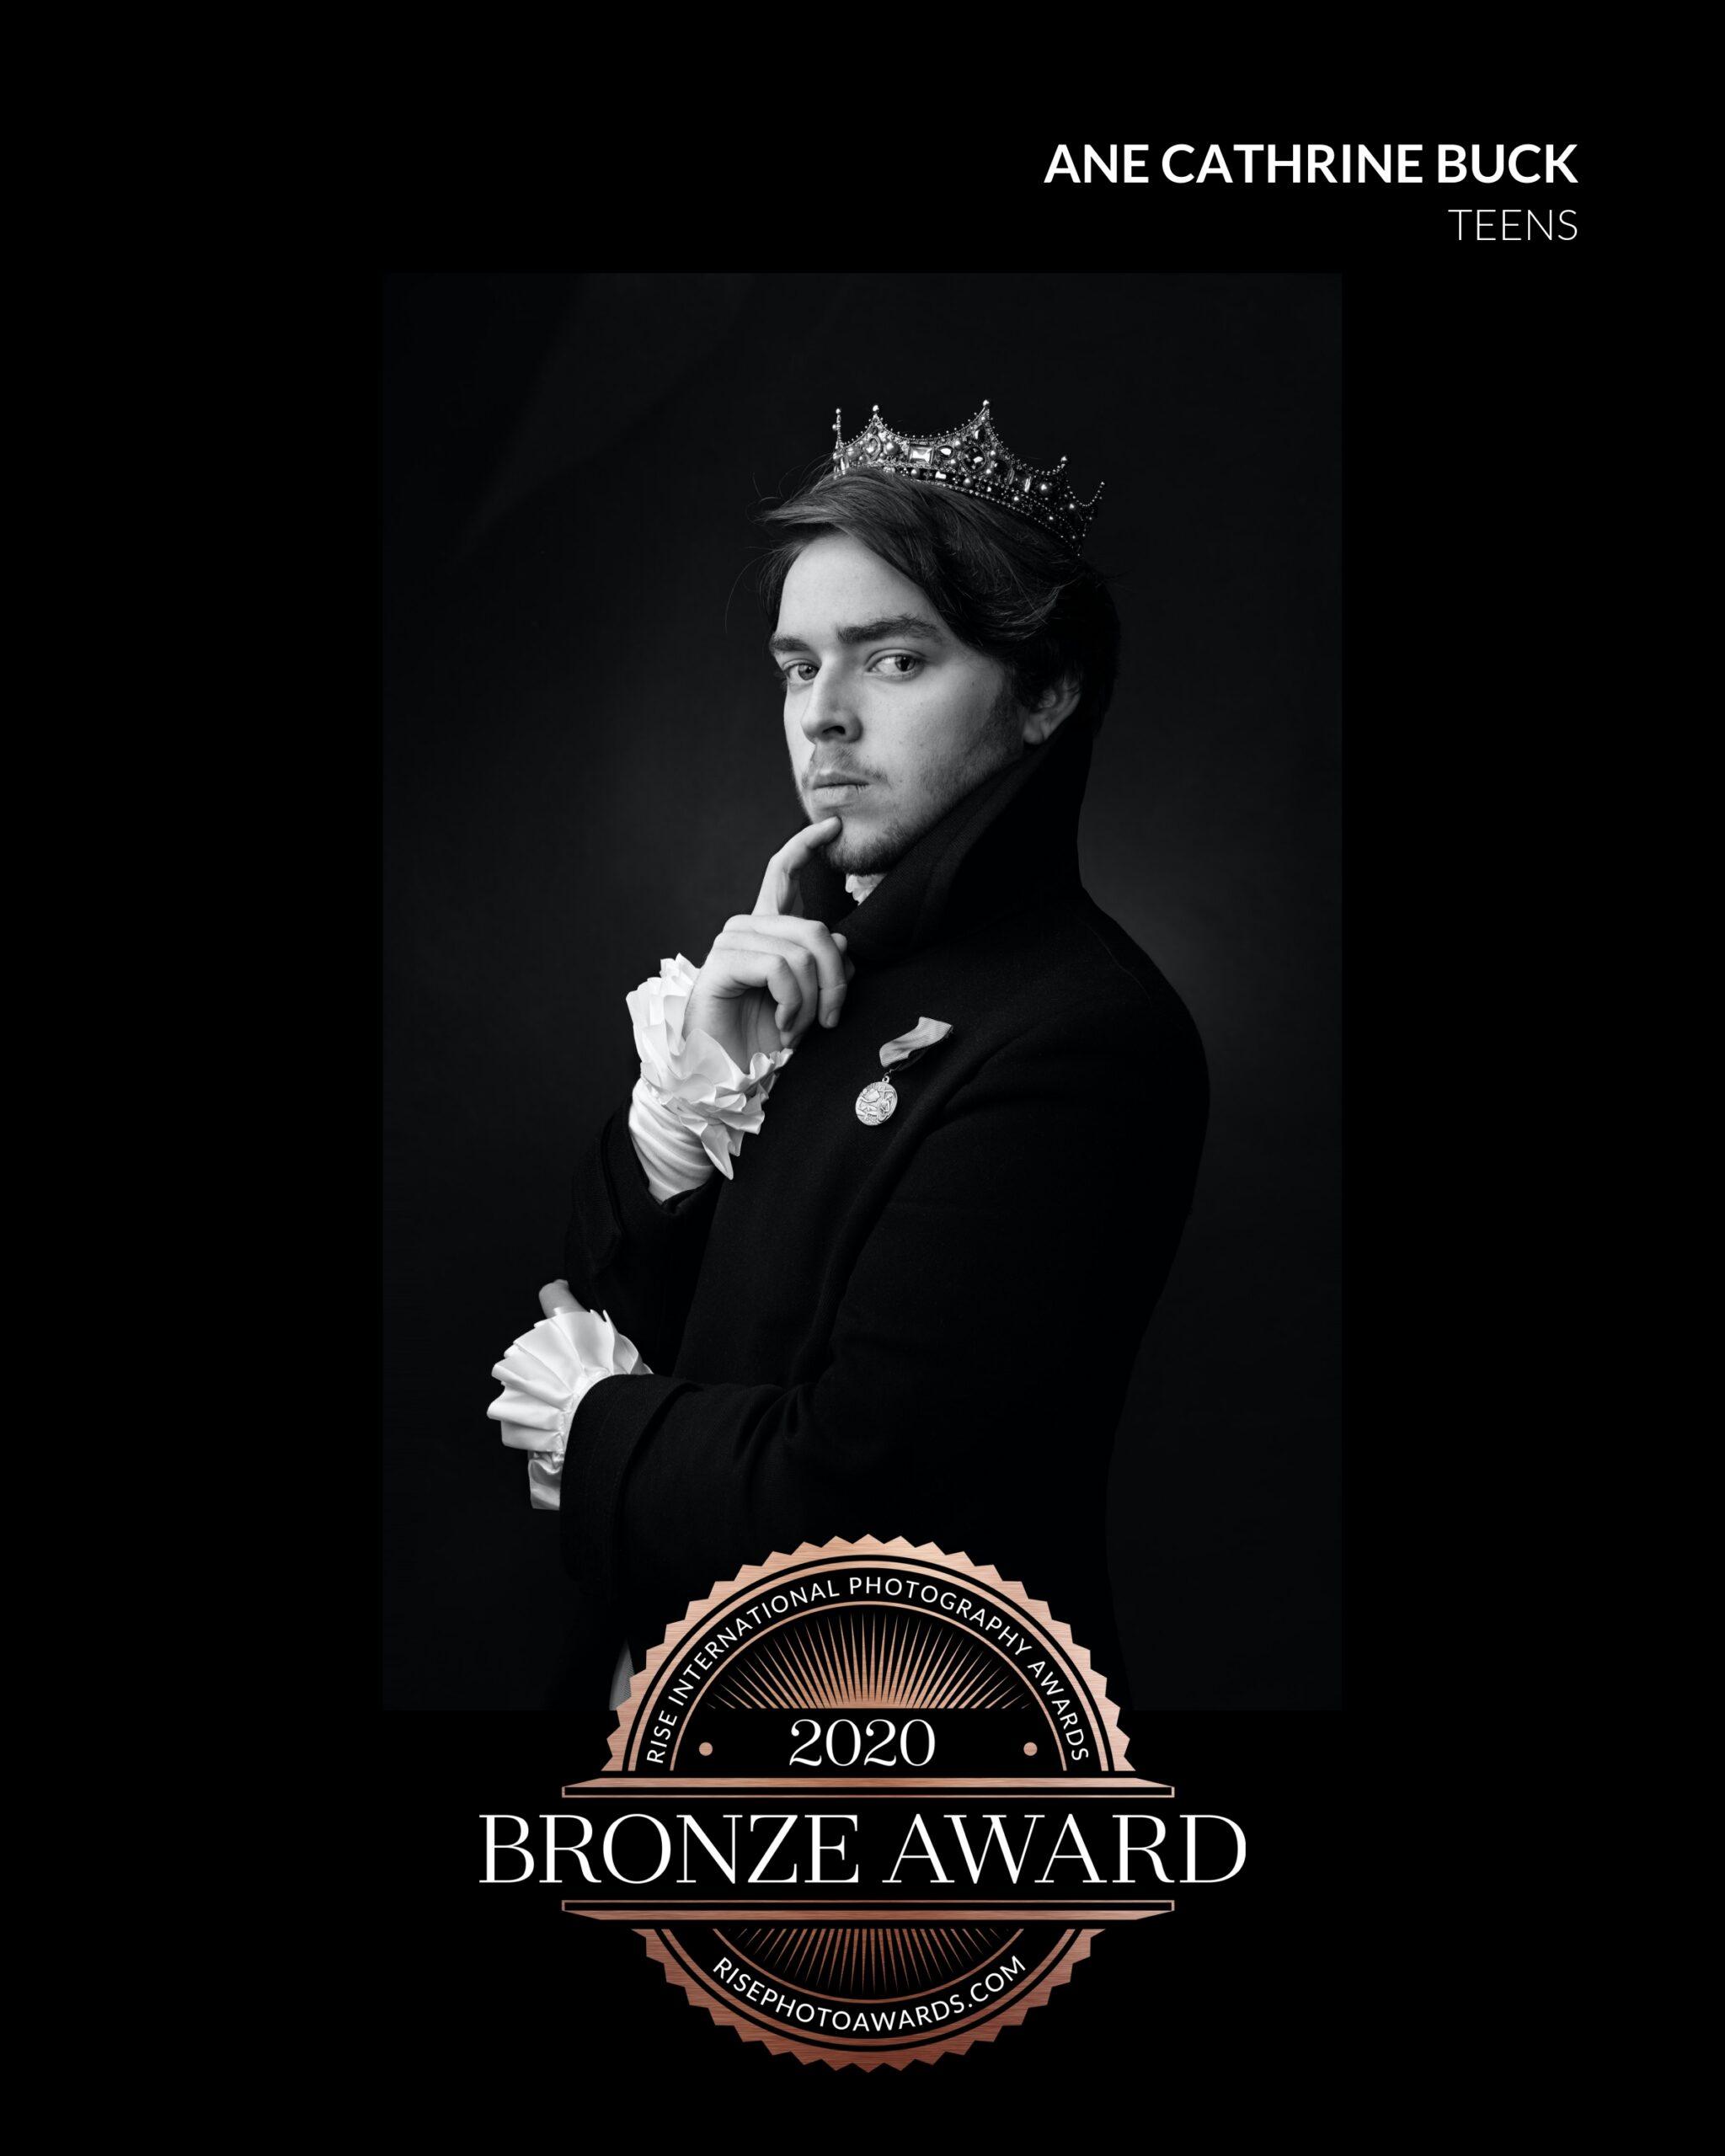 Prince bronsemedalje i international fotokonkurranse